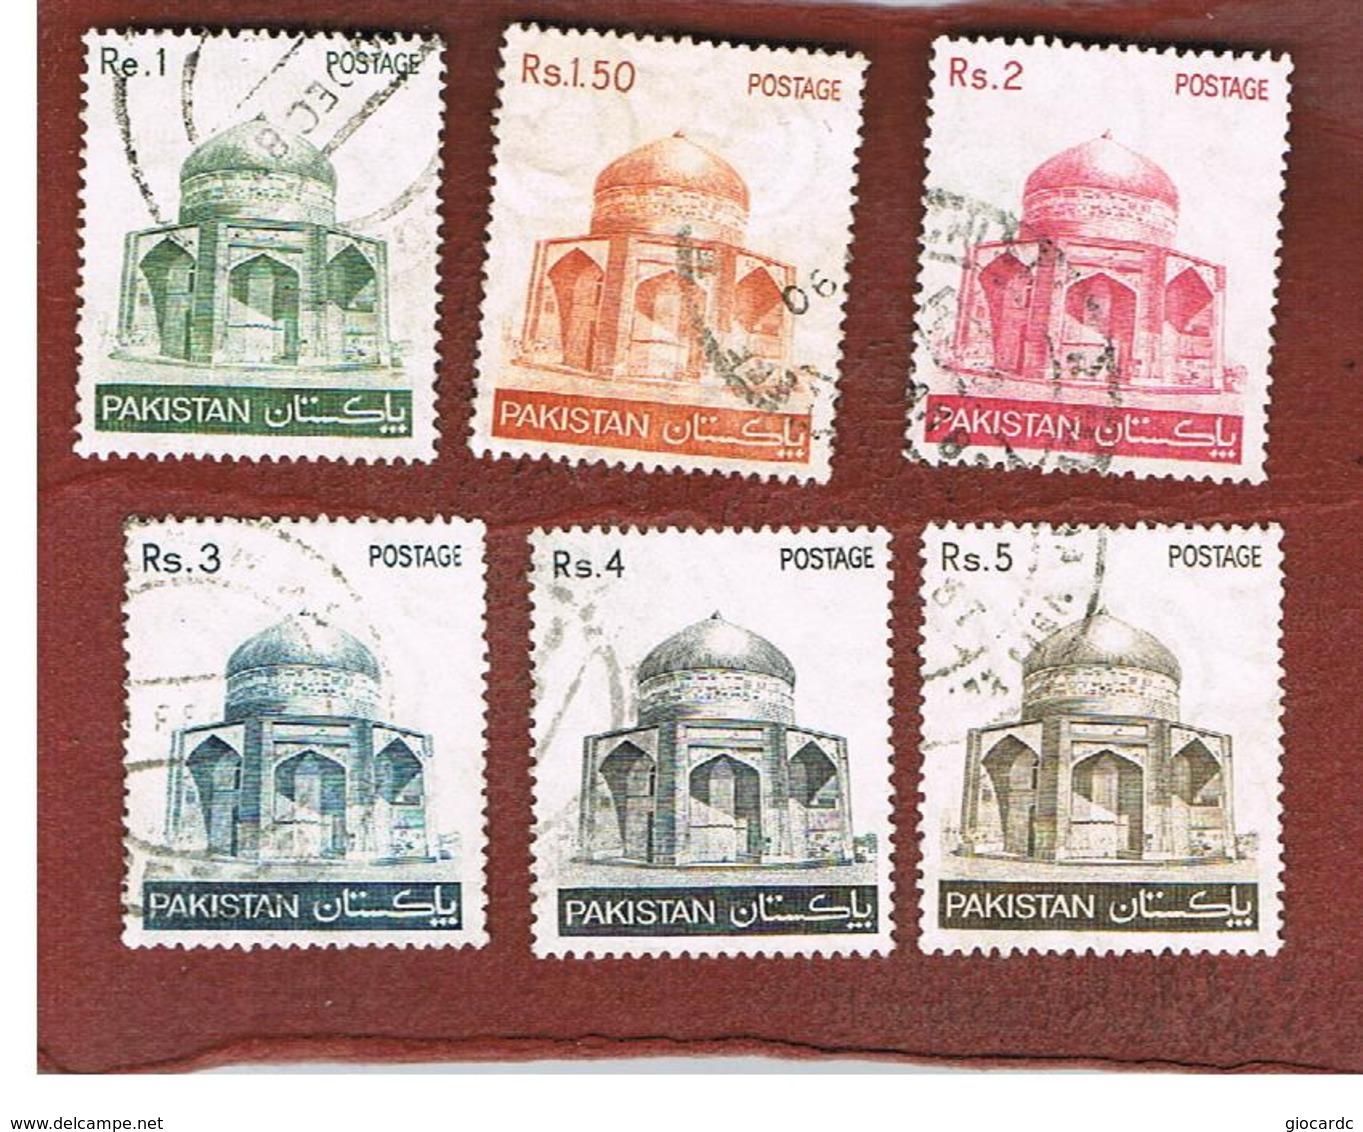 PAKISTAN  -  SG 475.480  -  1979  MAKLI MAUSOLEUM, THATTA (COMPLET SET OF 6)   -  USED ° - Pakistan